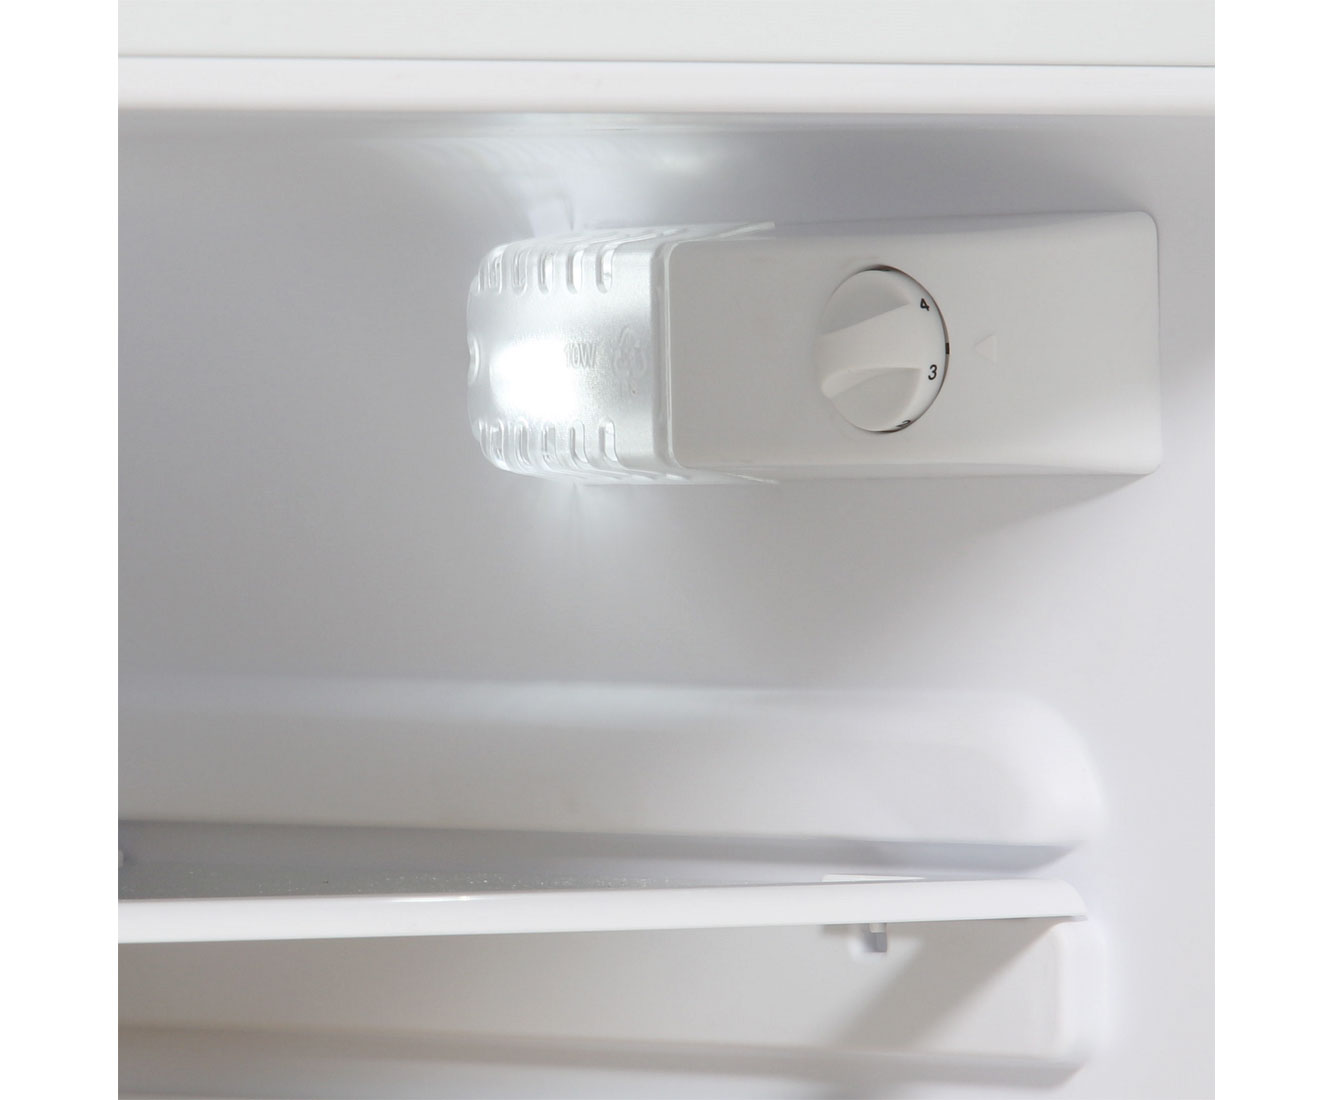 Amica Kühlschrank Uvks 16149 : Amica uvks kühlschrank unterbau cm weiß neu ebay